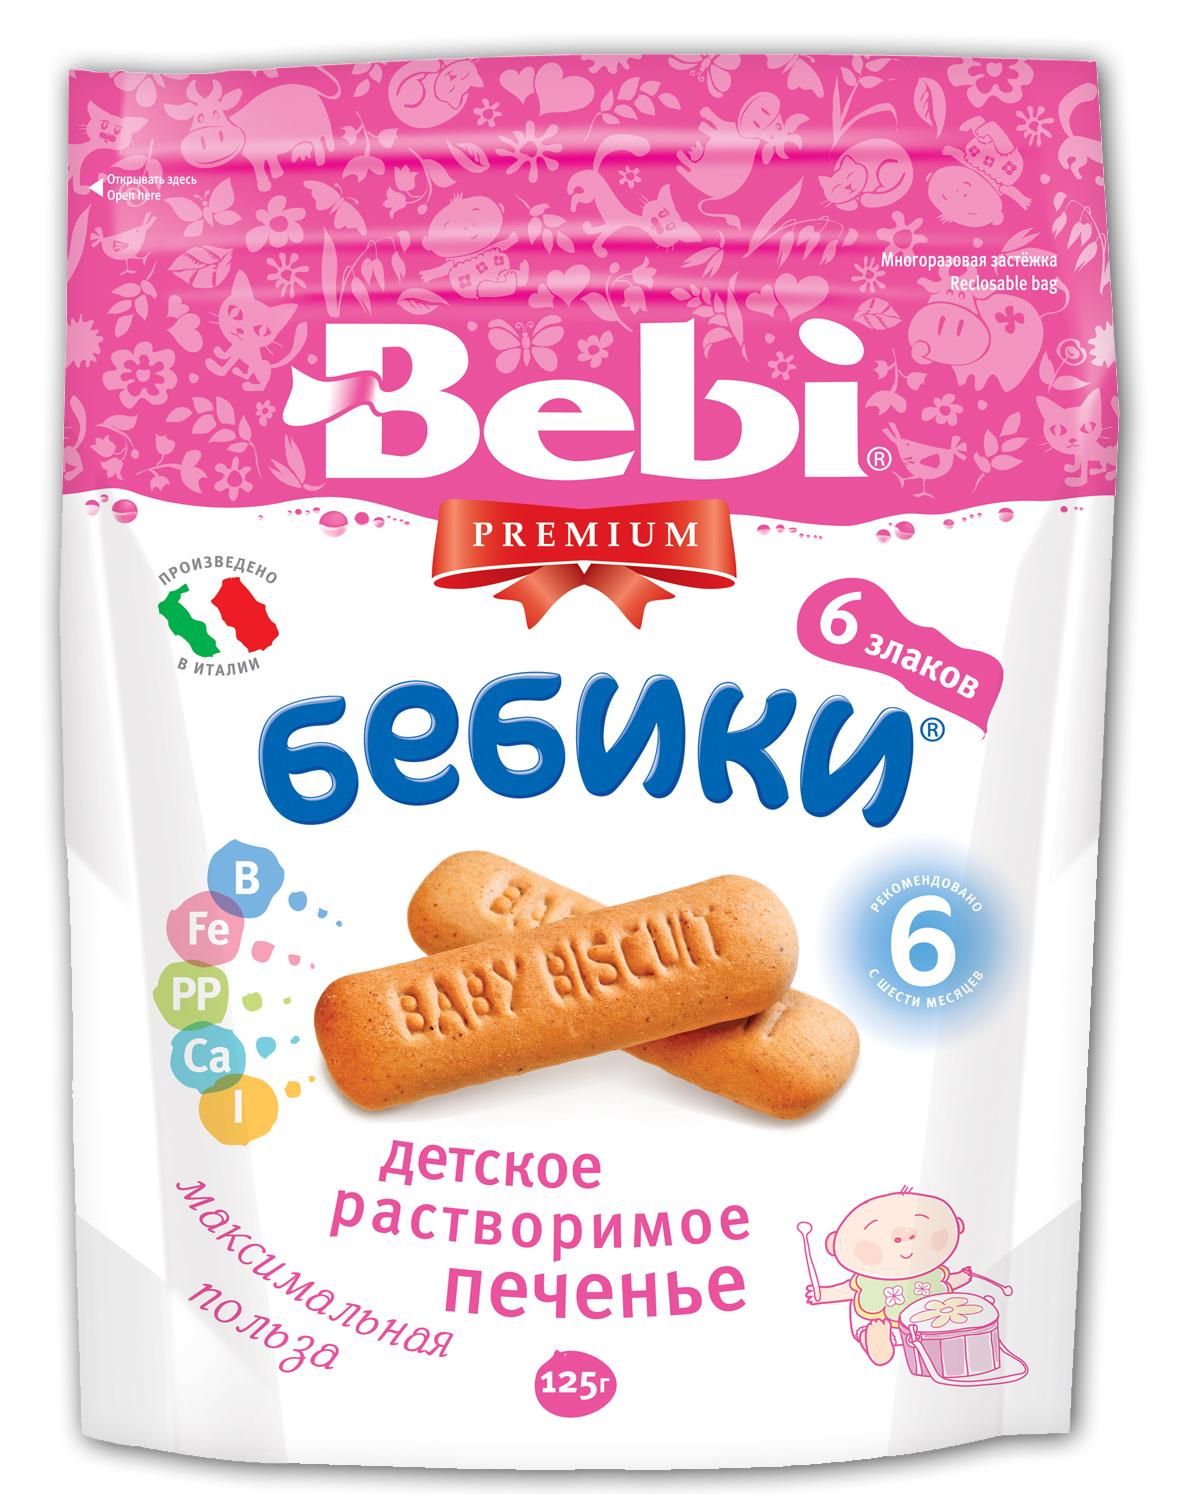 """Беби"" Детское печенье Bebi Premium ""БЕБИКИ 6 злаков"" 125,0"